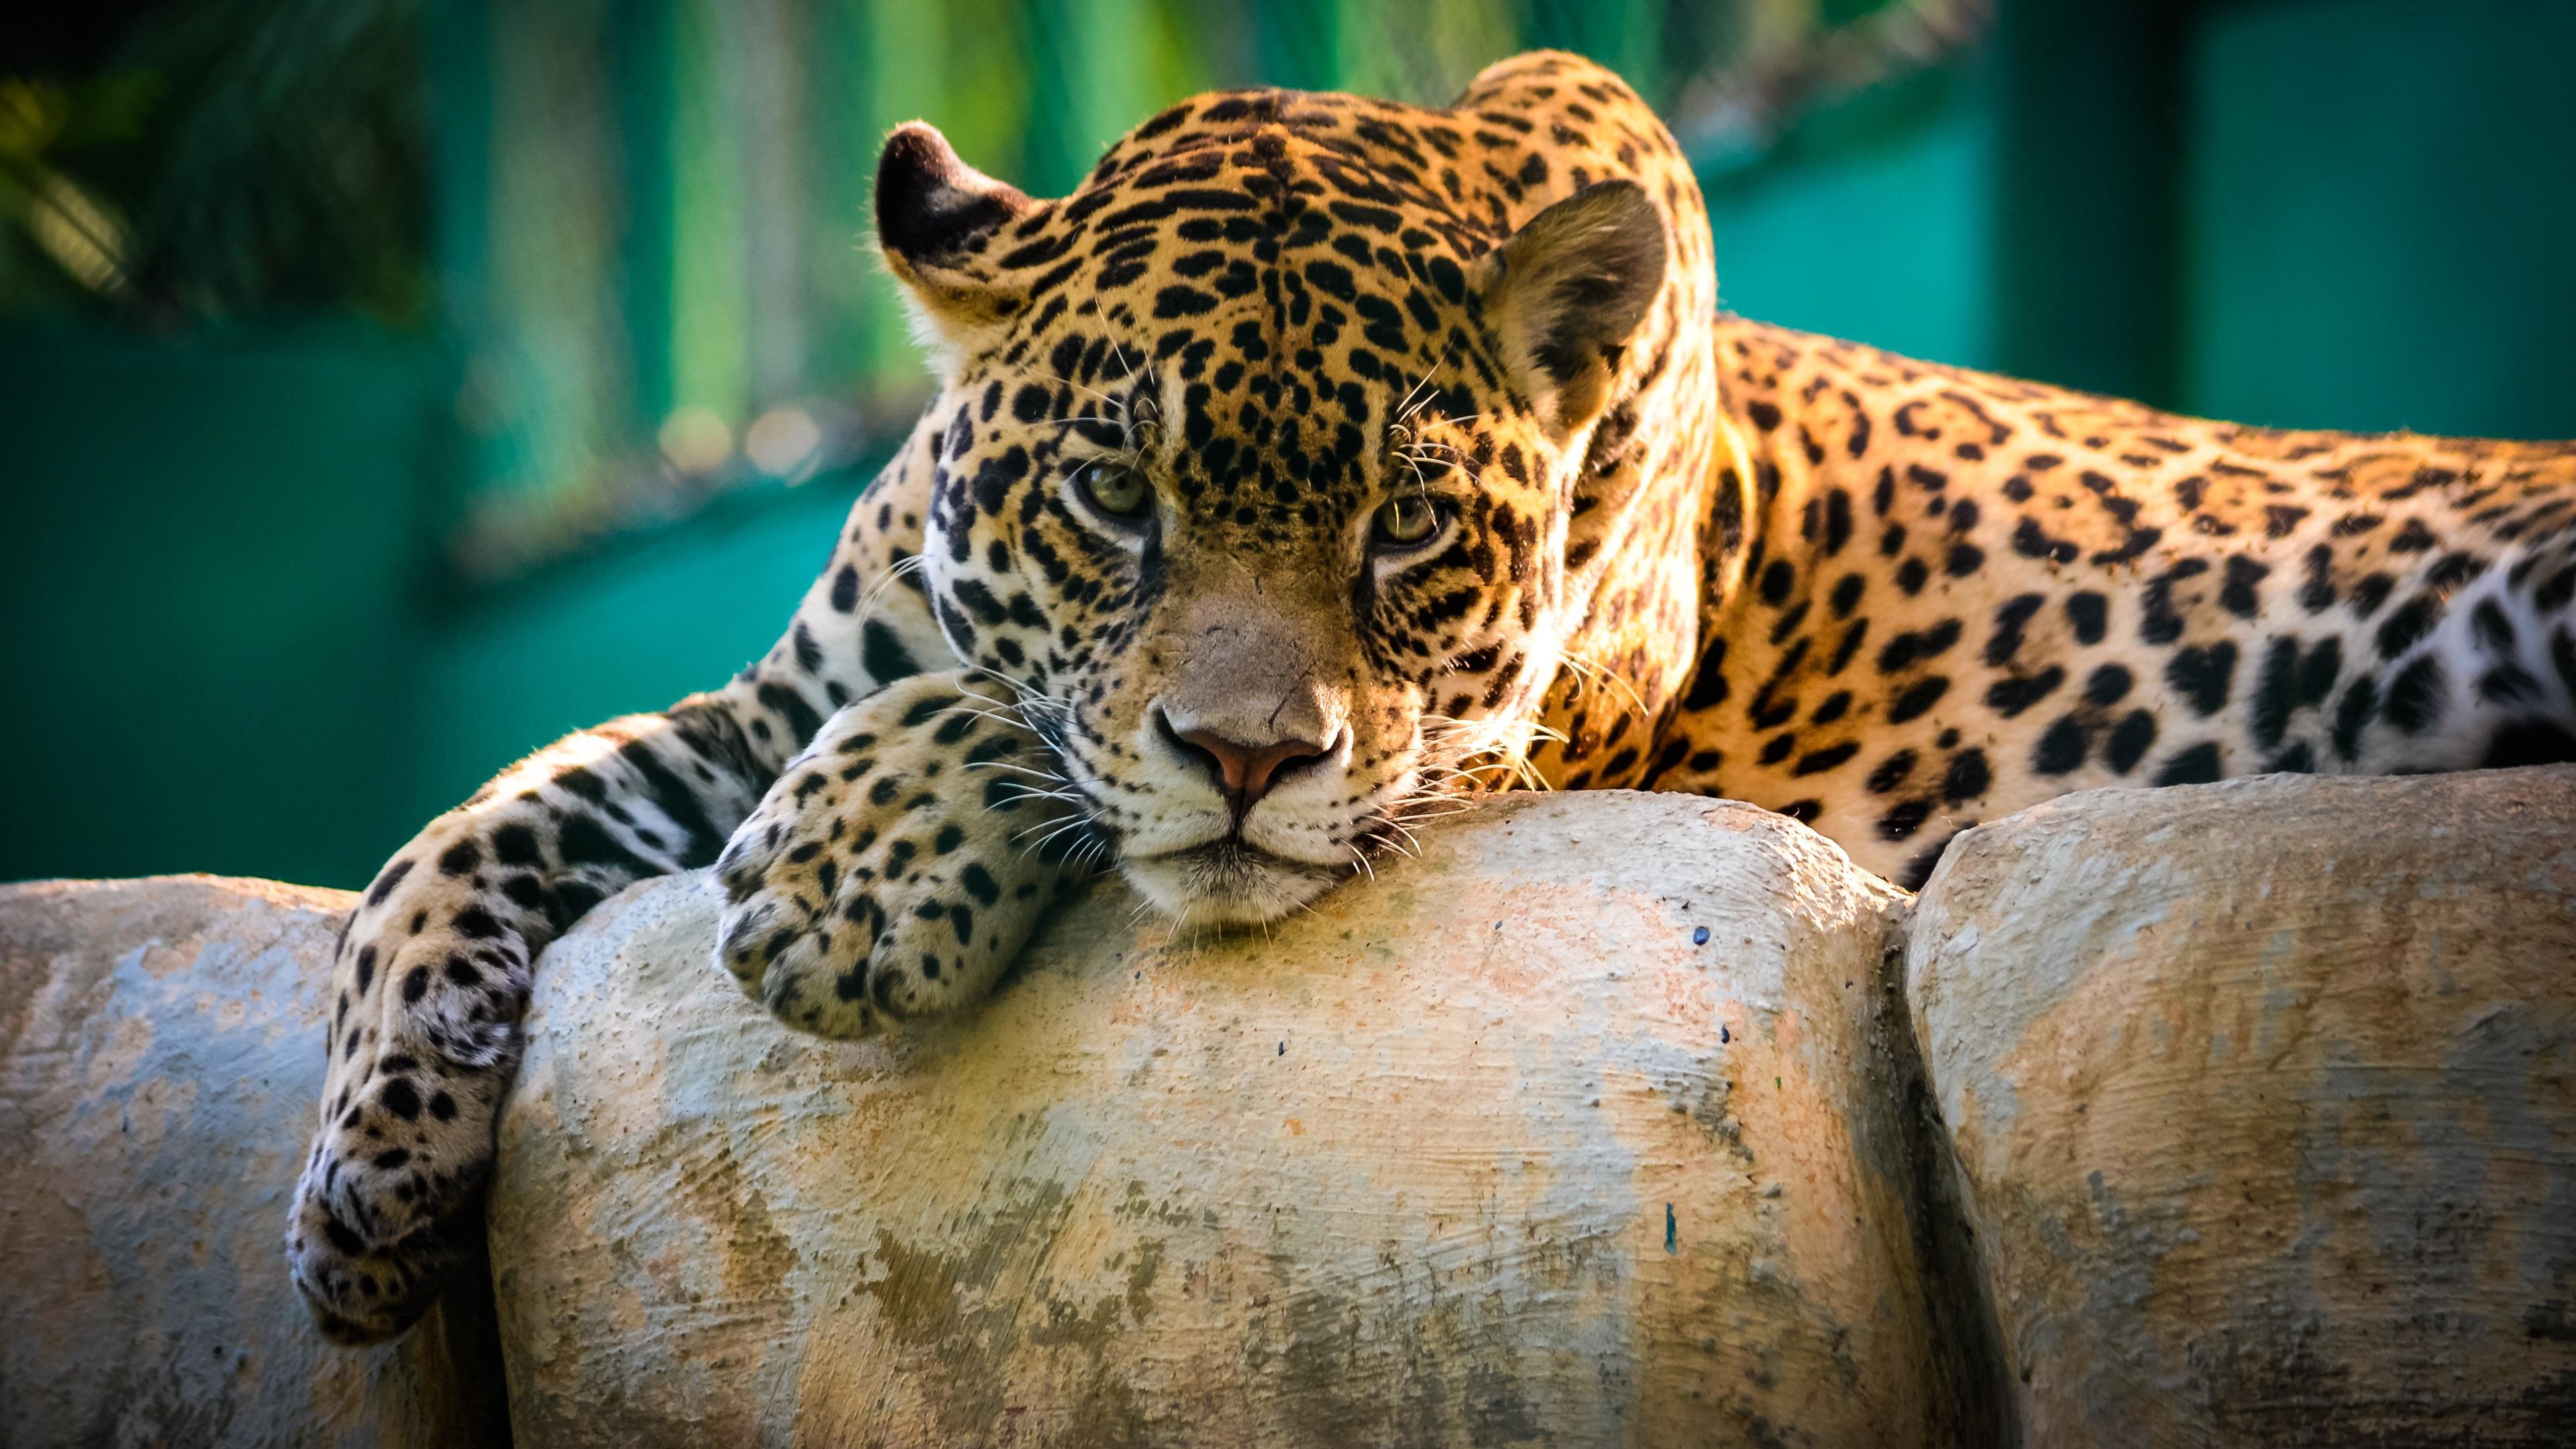 jaguar_mexico-3840x2160_07022018090359.jpg